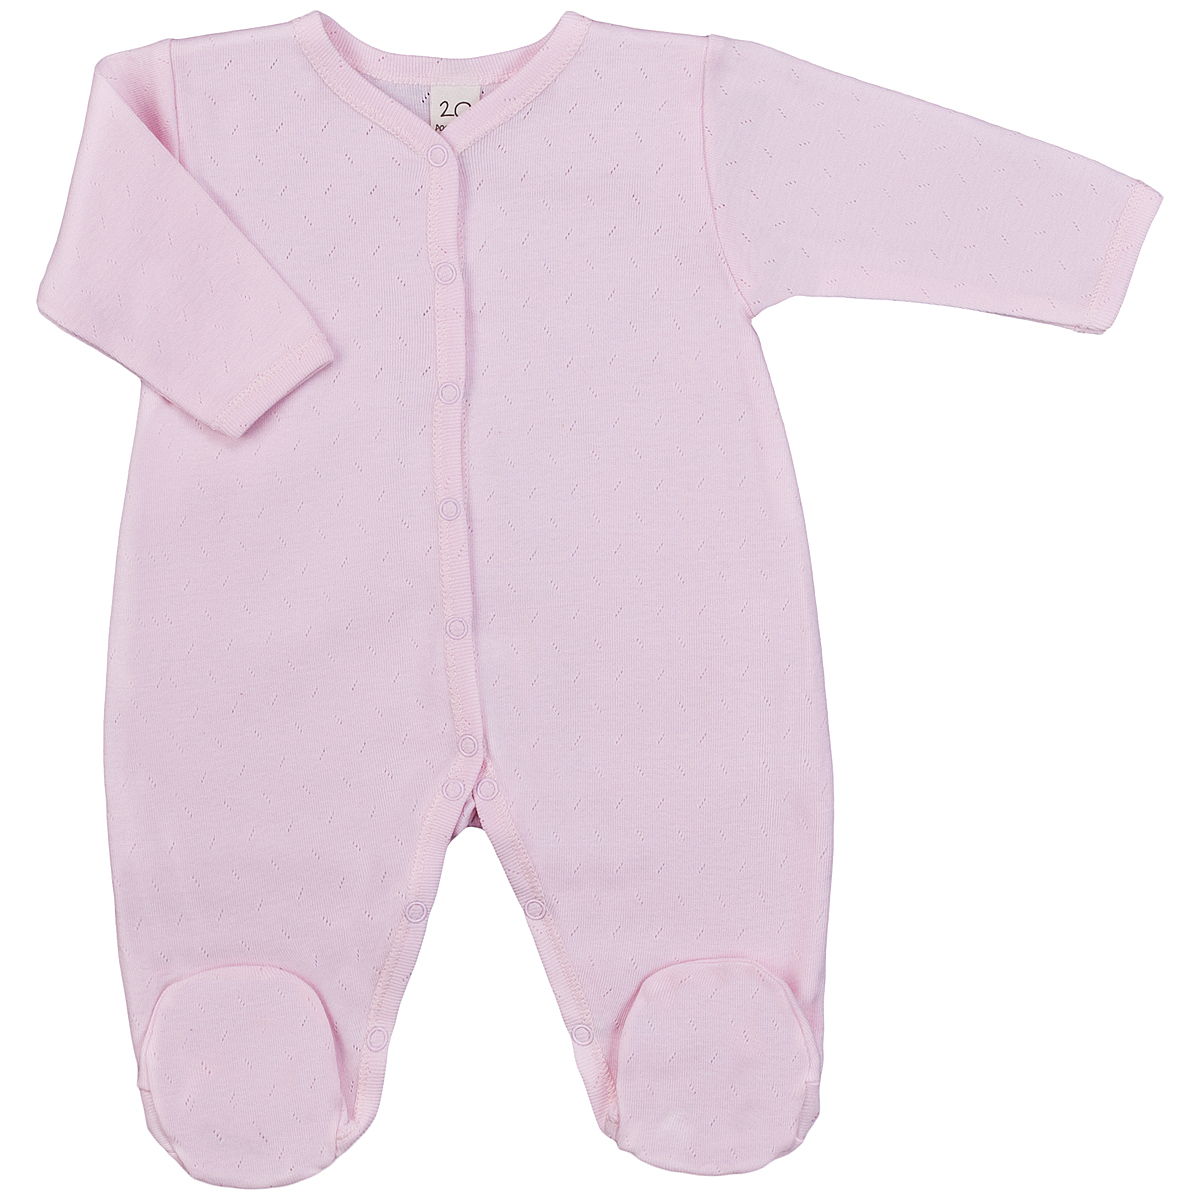 Комбинезон детский Lucky Child Ажур, цвет: розовый. 0-12. Размер 80/86